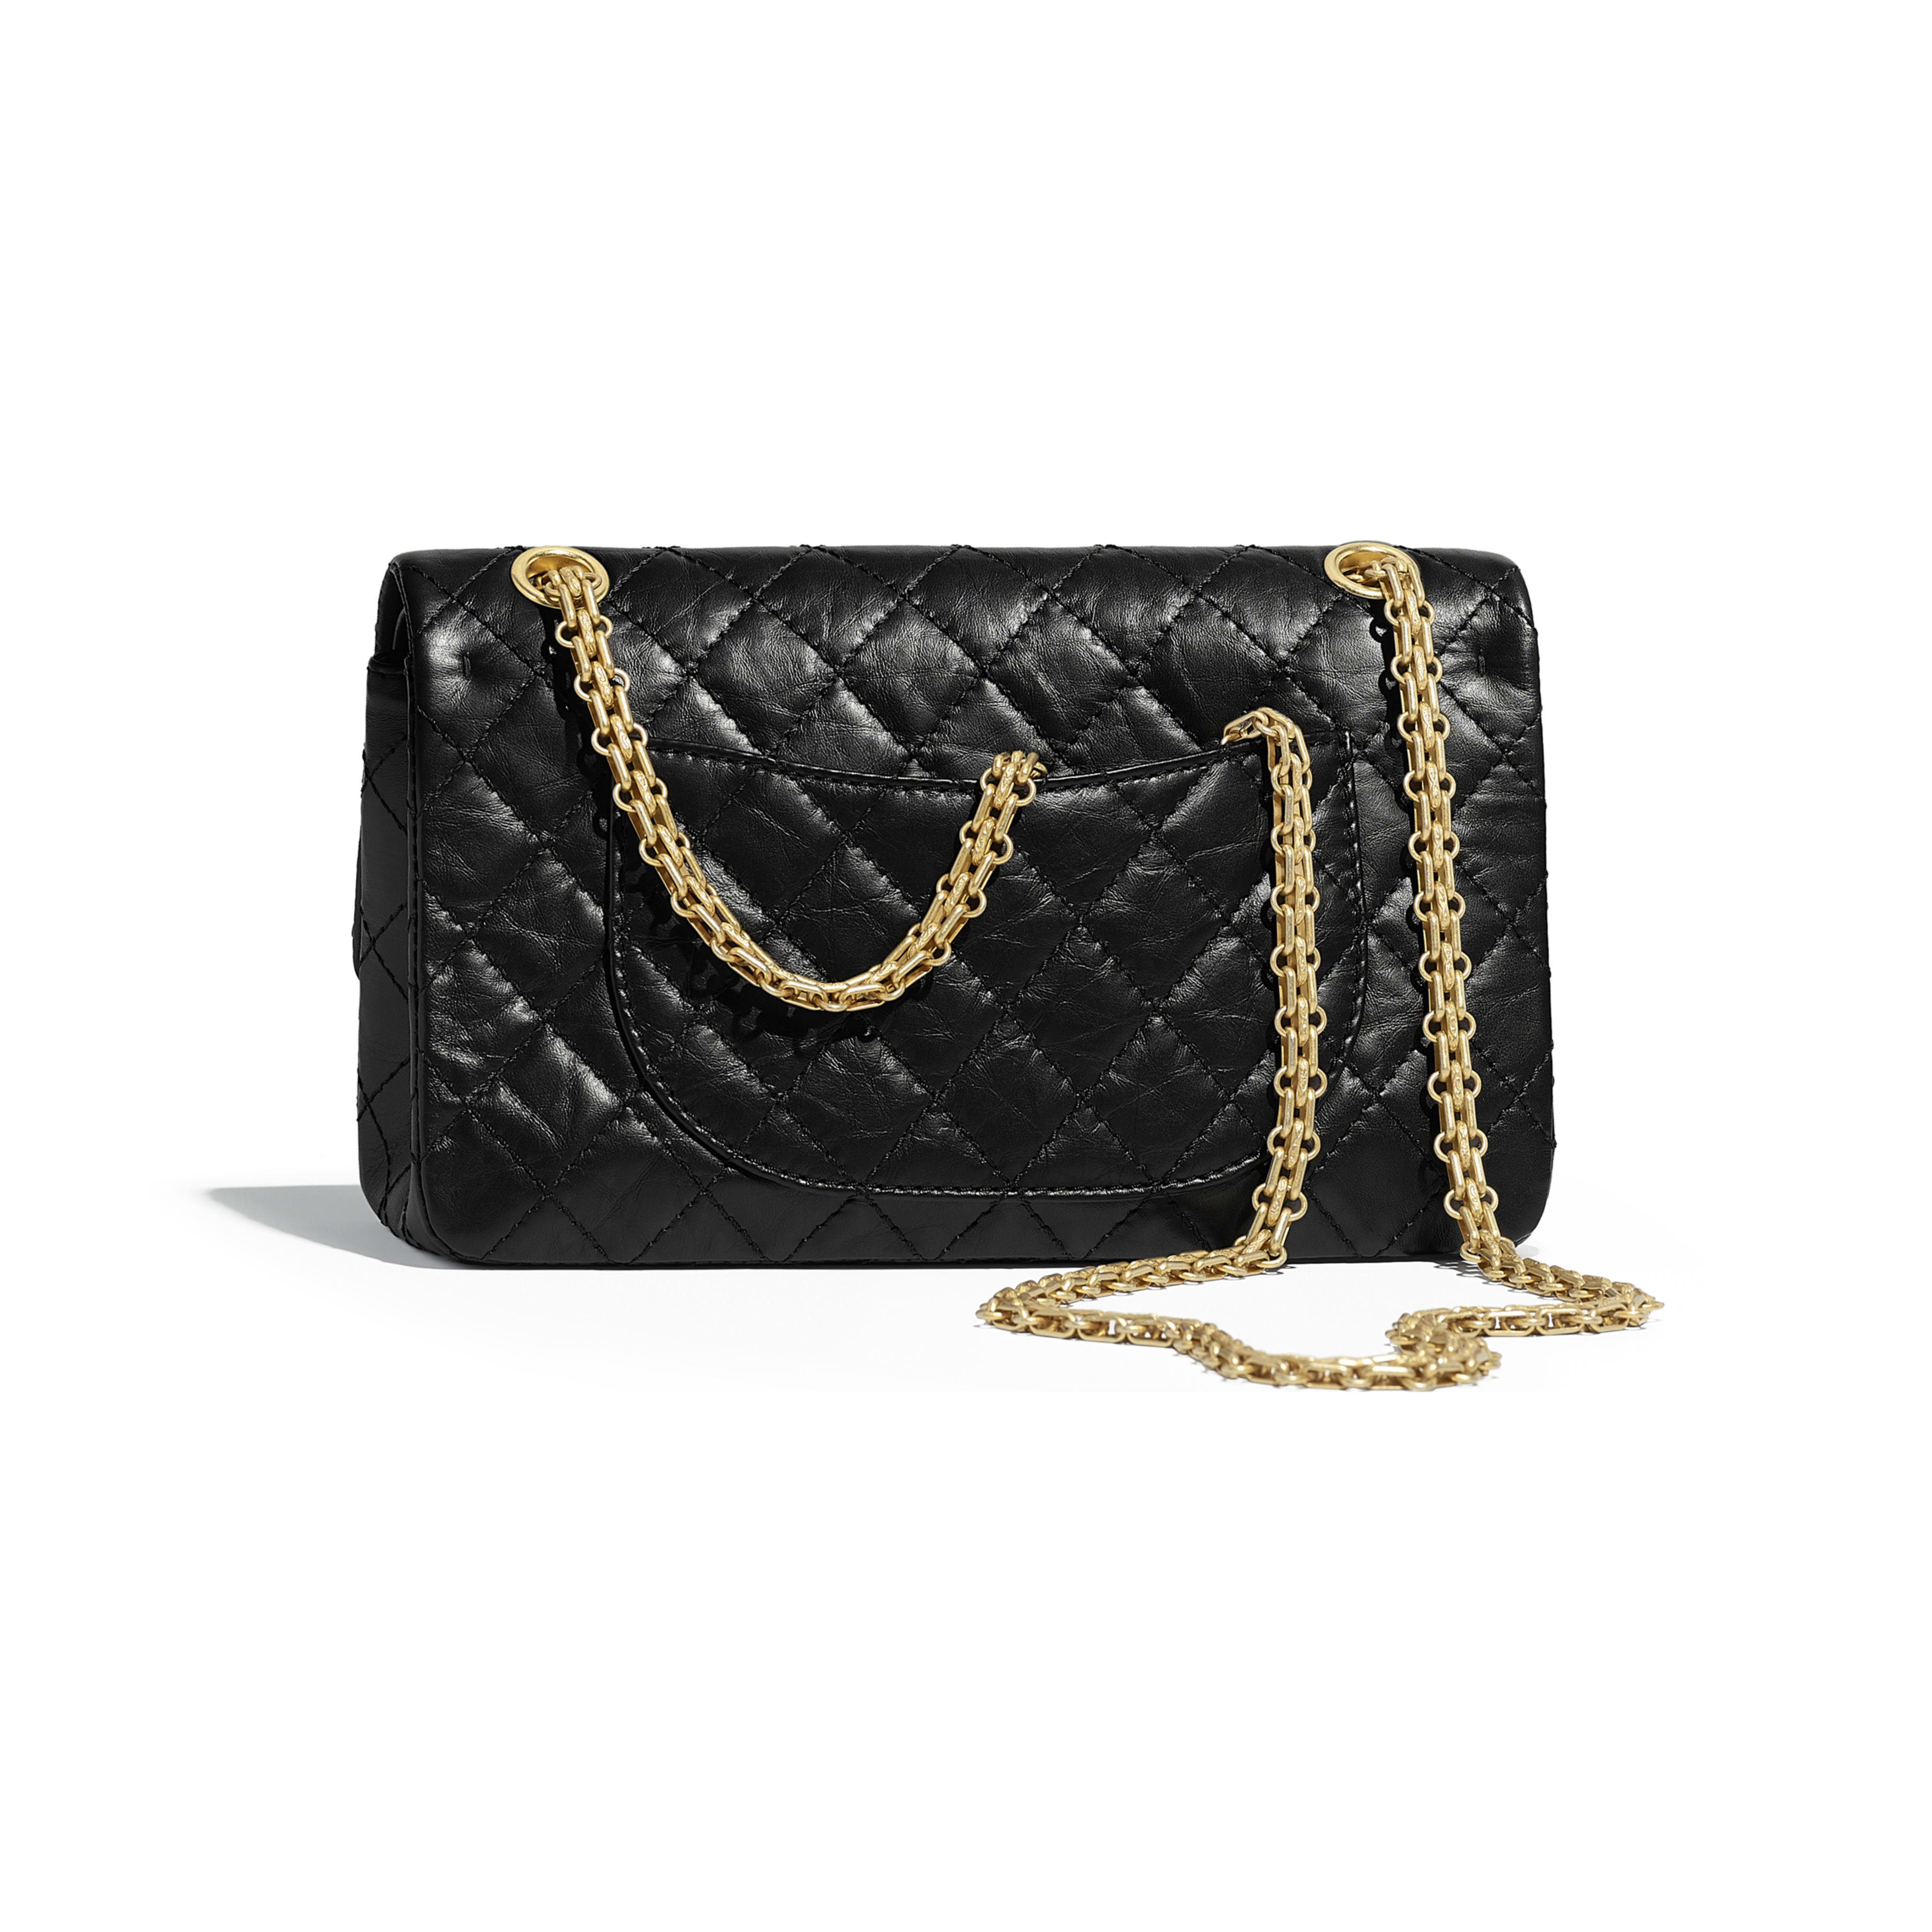 2.55 Handbag - Black - Aged Calfskin, Charms & Gold-Tone Metal - Alternative view - see full sized version